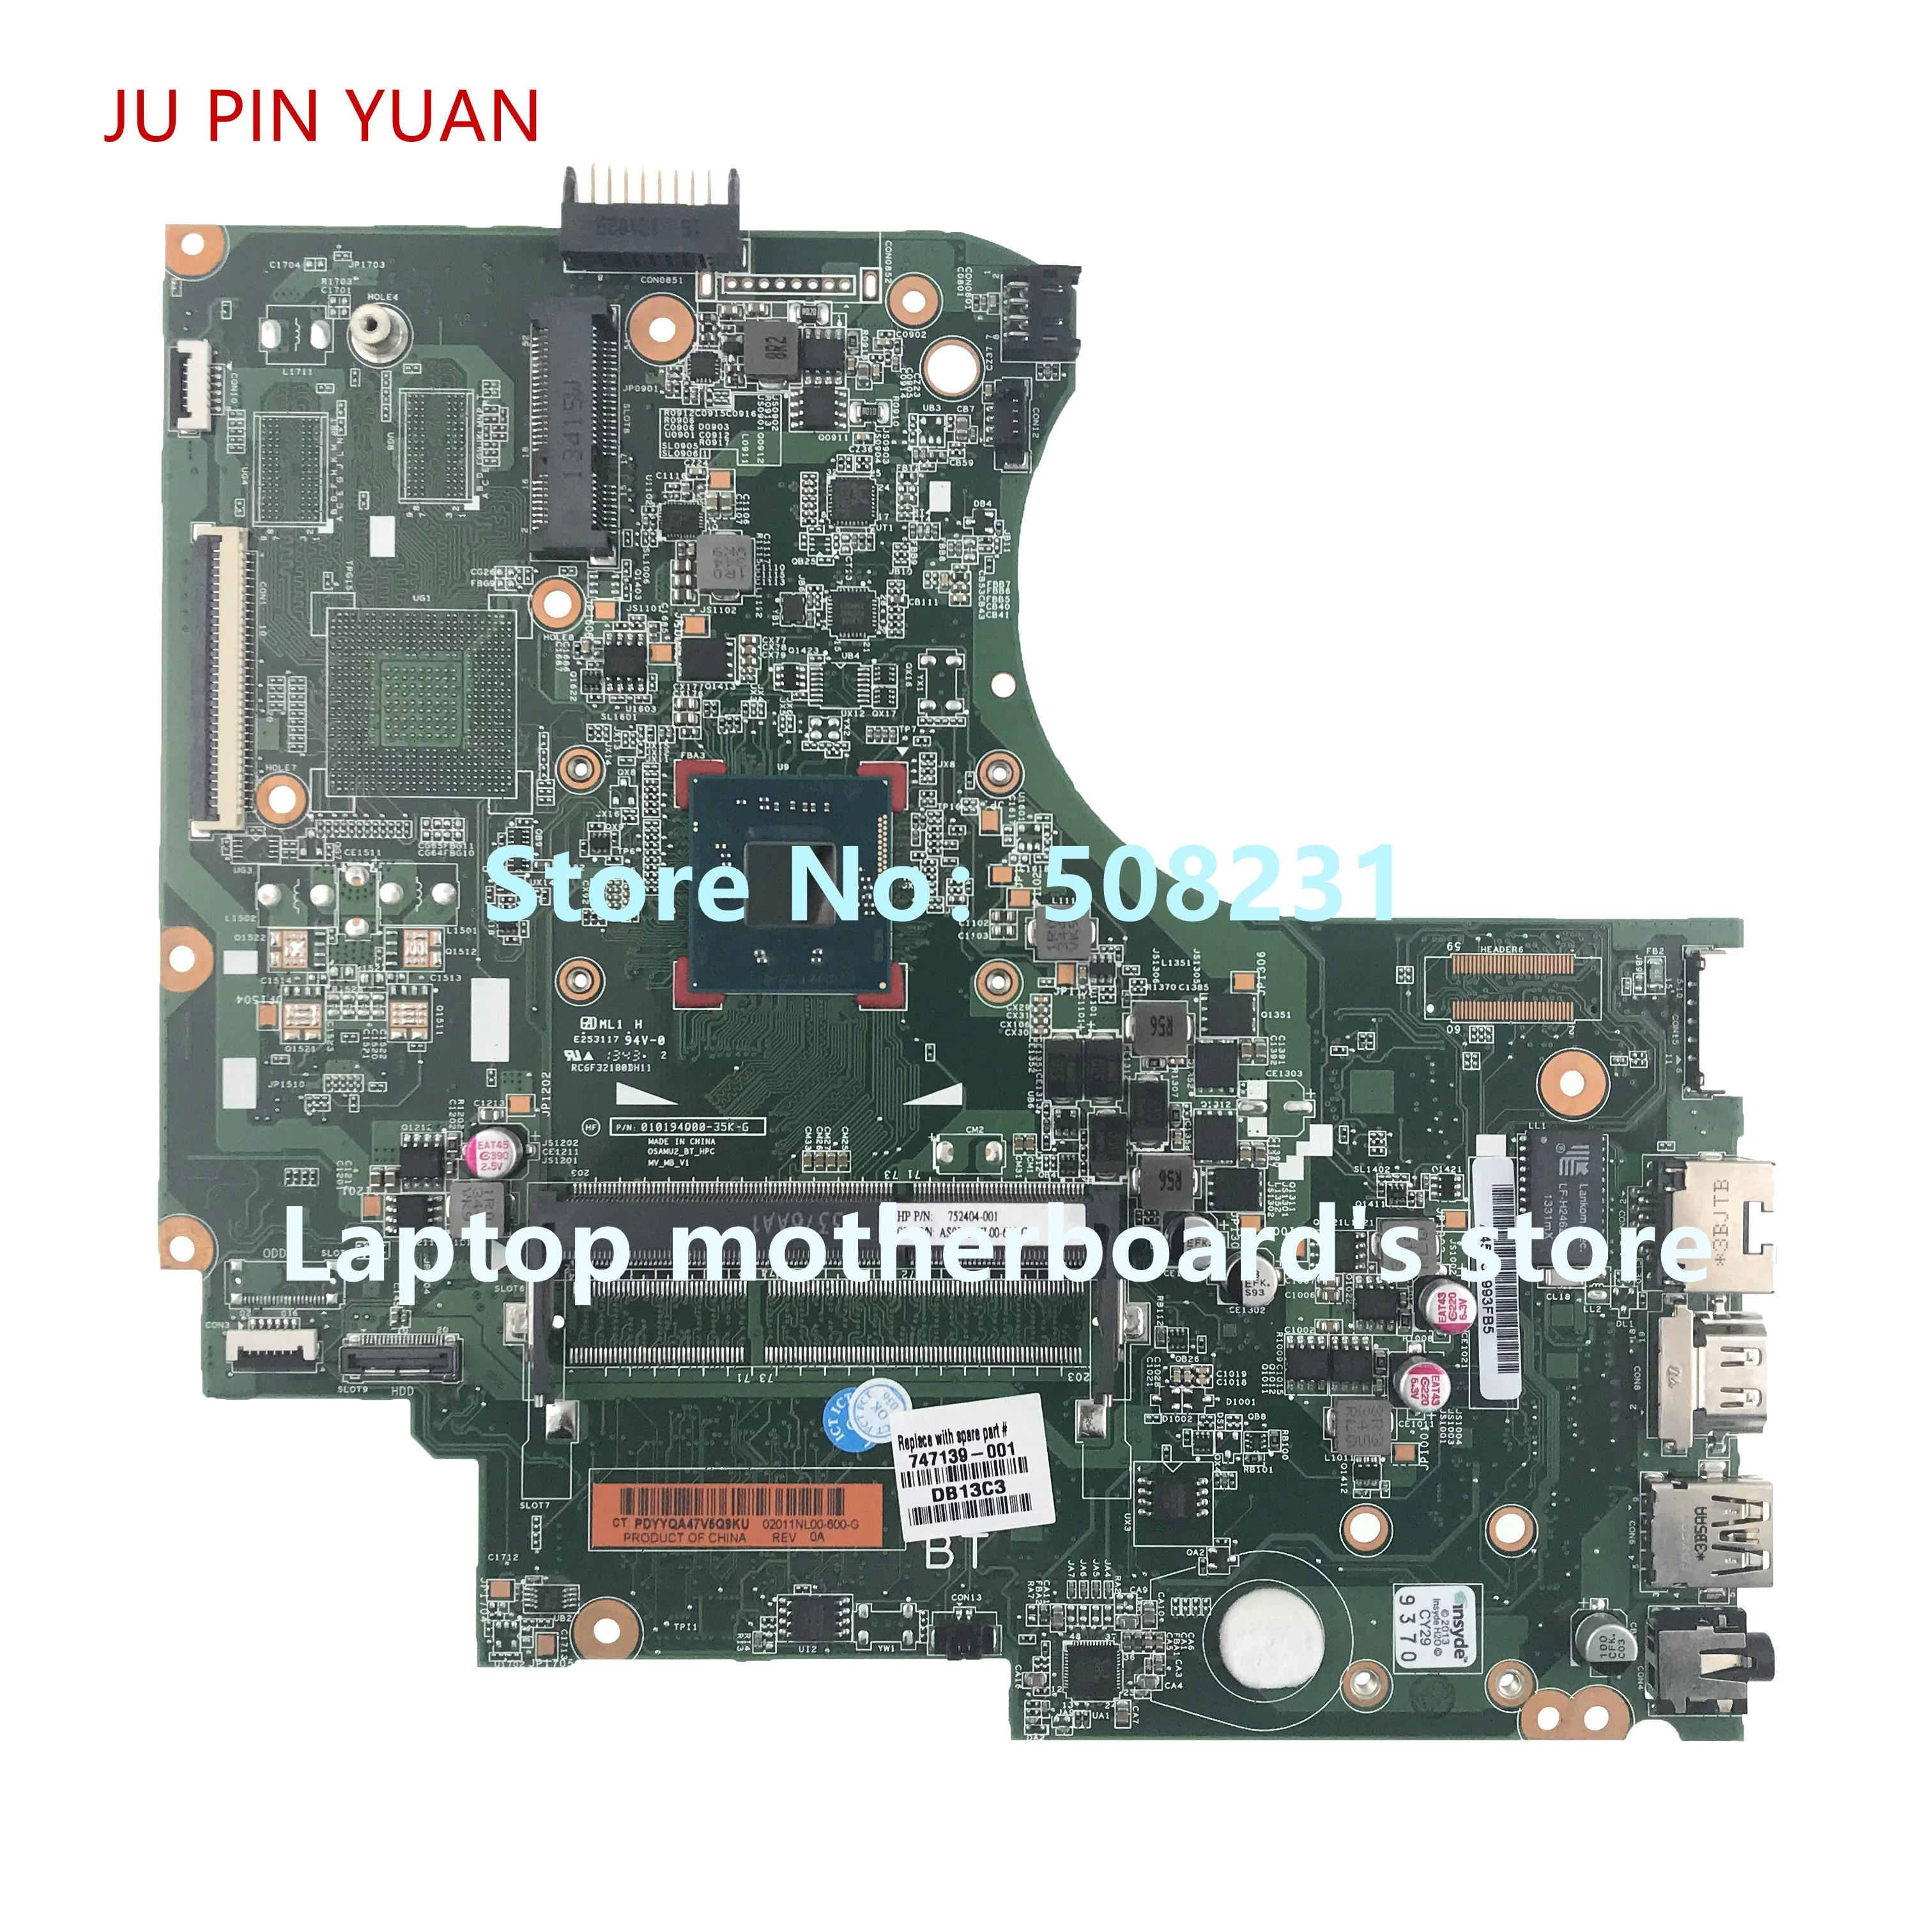 Ju Pin Yuan 747139-501 747139-001 Scheda Madre per Hp 15-D 250 G2 Scheda Madre Del Computer Portatile 100% Completamente Provato